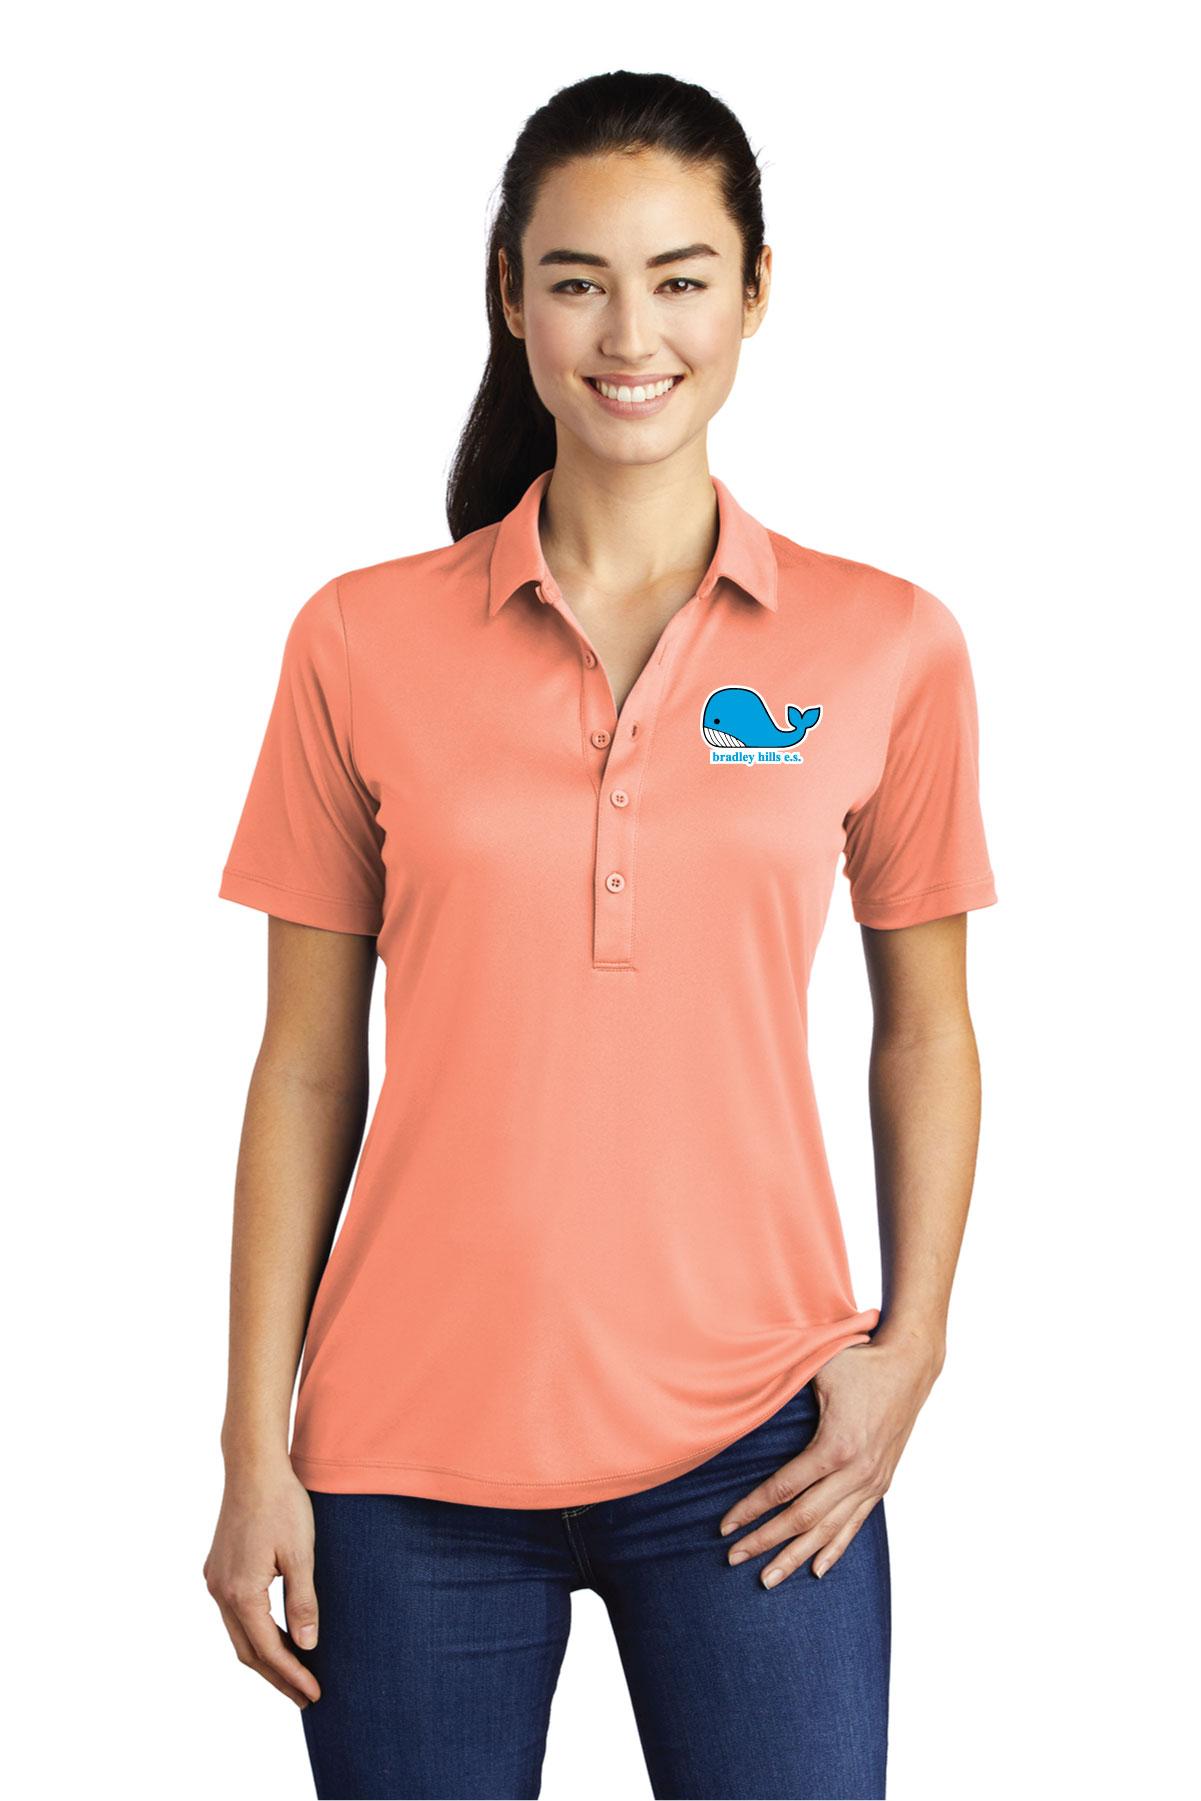 Sport-Tek® Ladies Posi-UV Pro Polo.-Sport-Tek